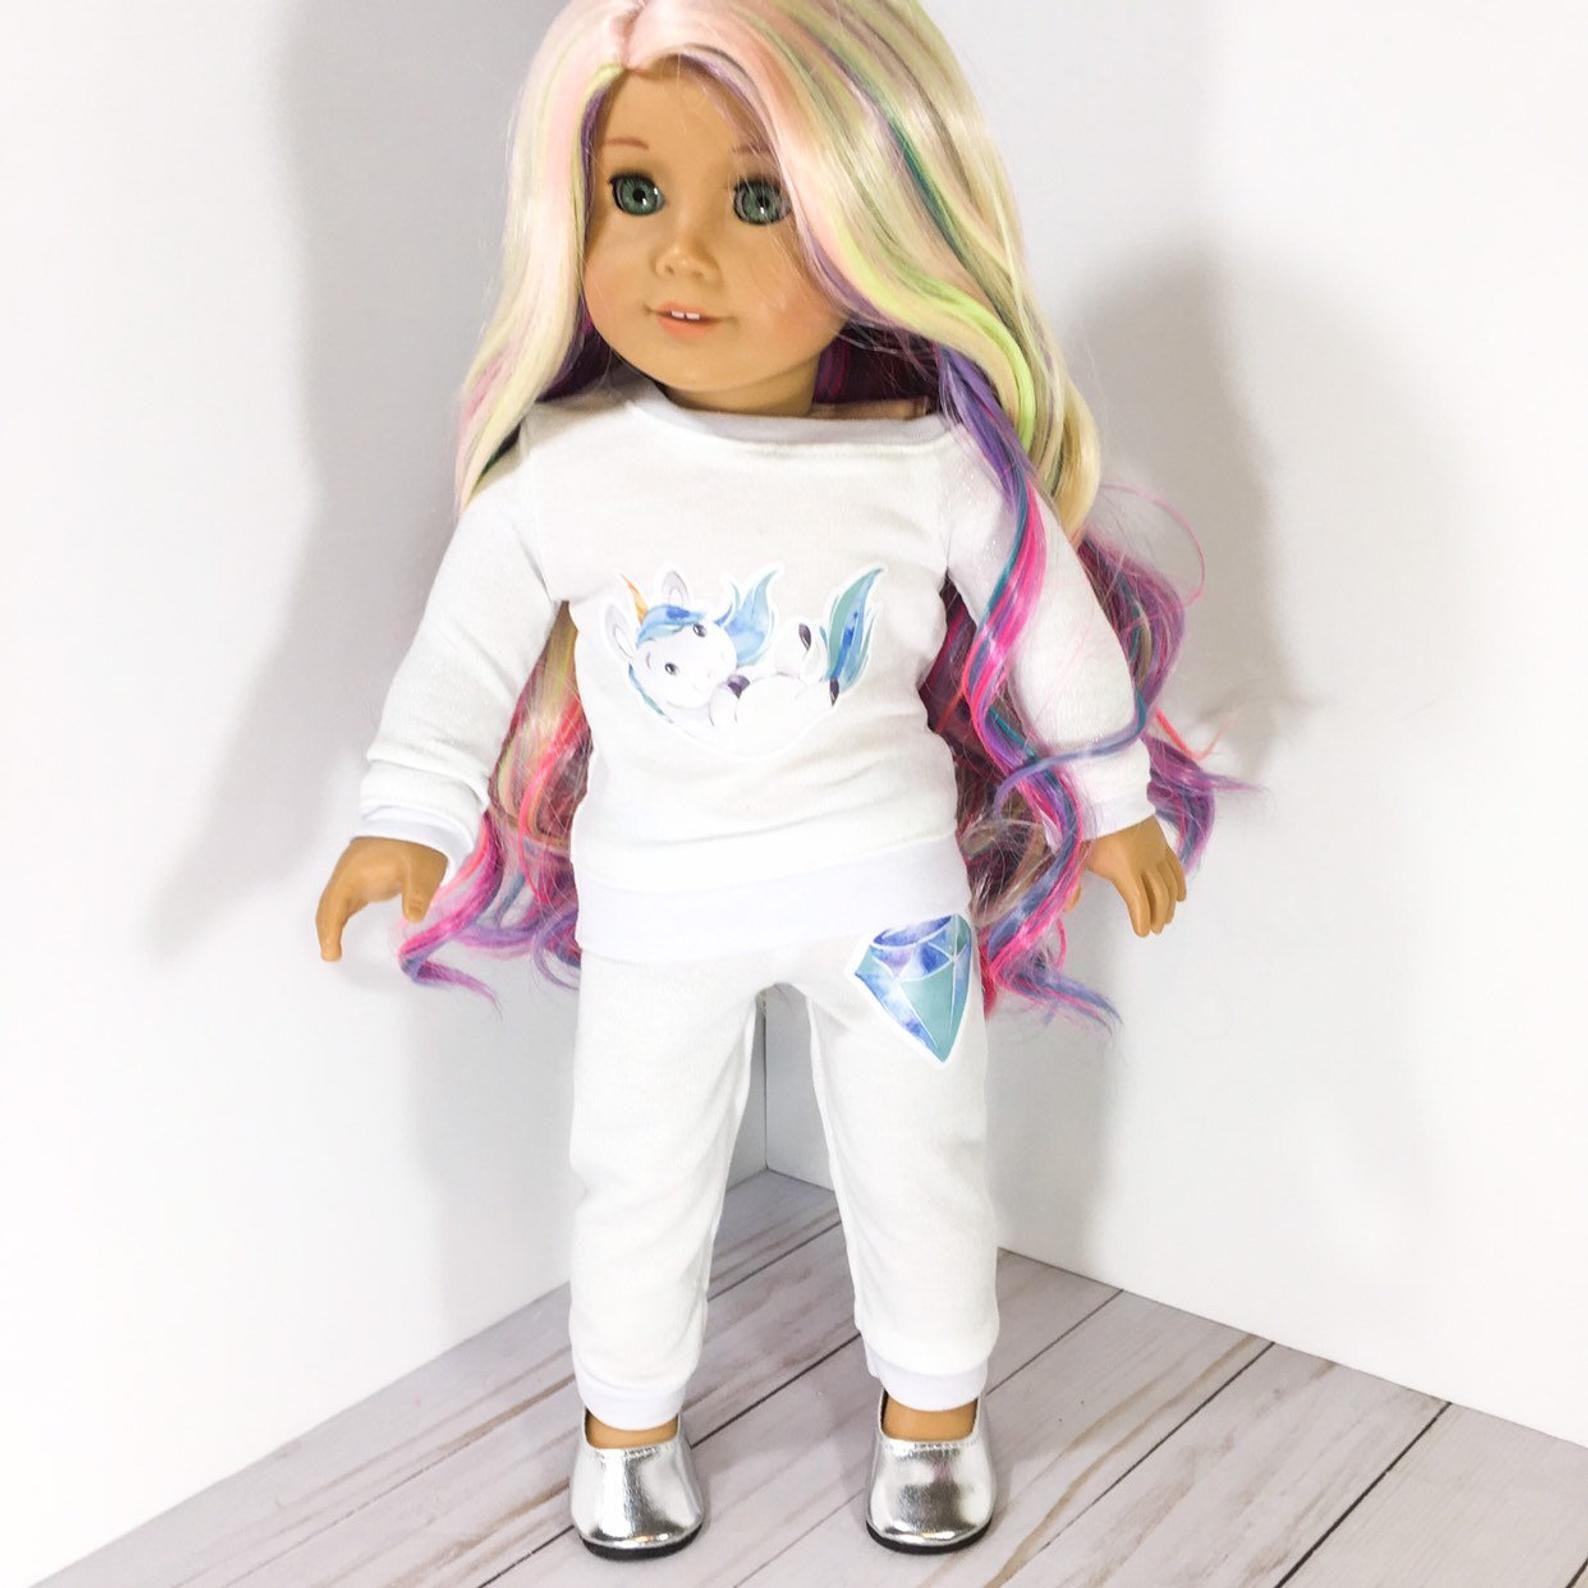 18 inch doll Clothes - unicorn diamond graphic Doll jogger pants